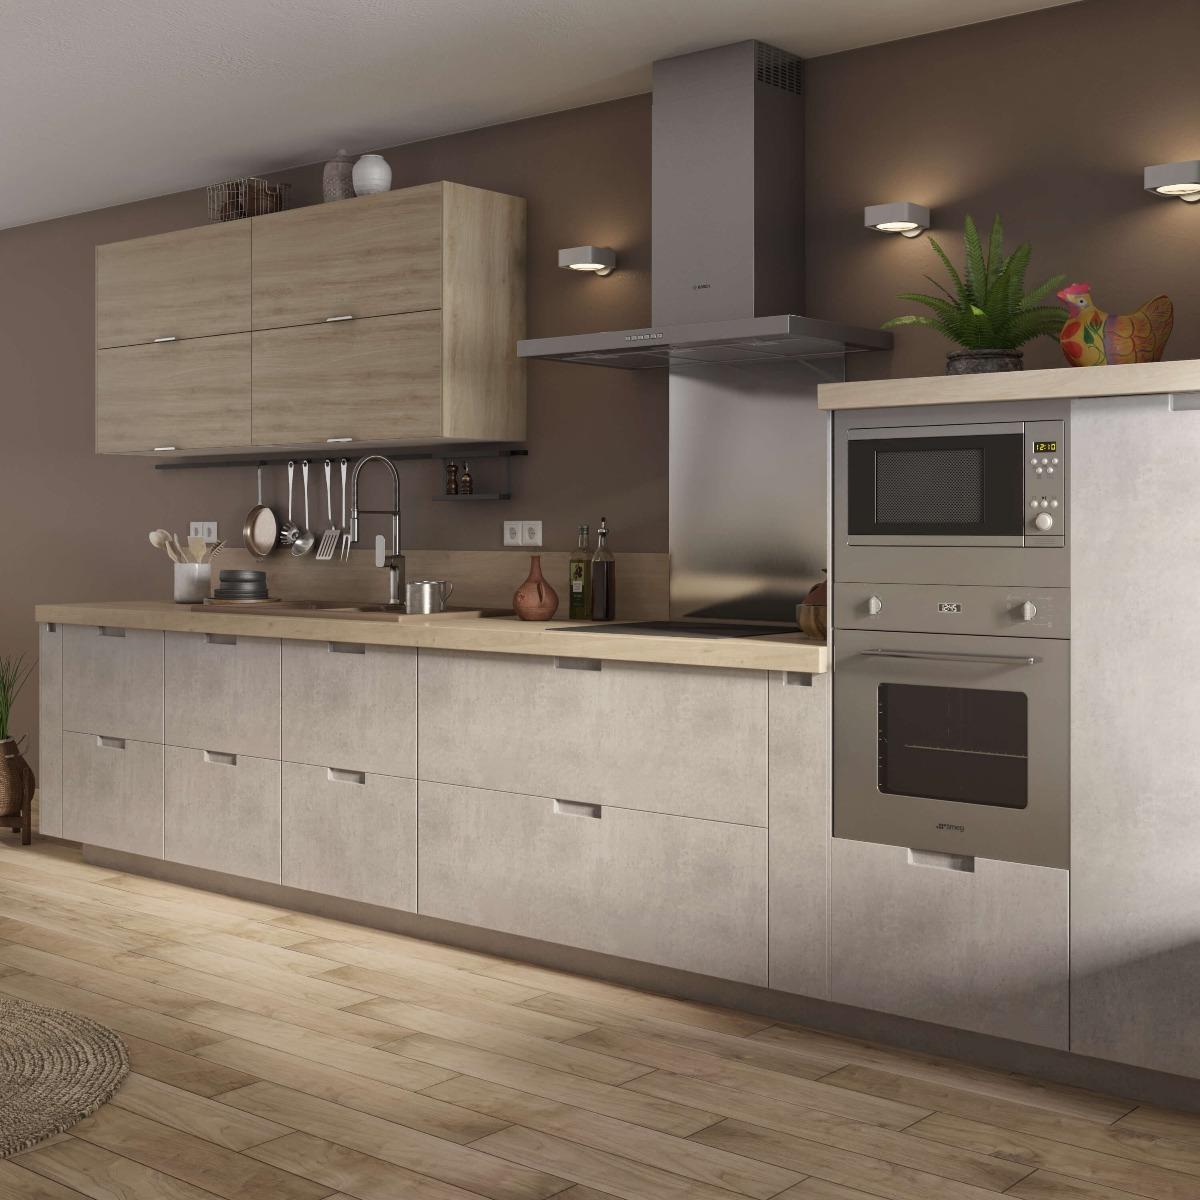 Delinia Berlin Designer Kitchen By Leroy Merlin Leroy Merlin South Africa